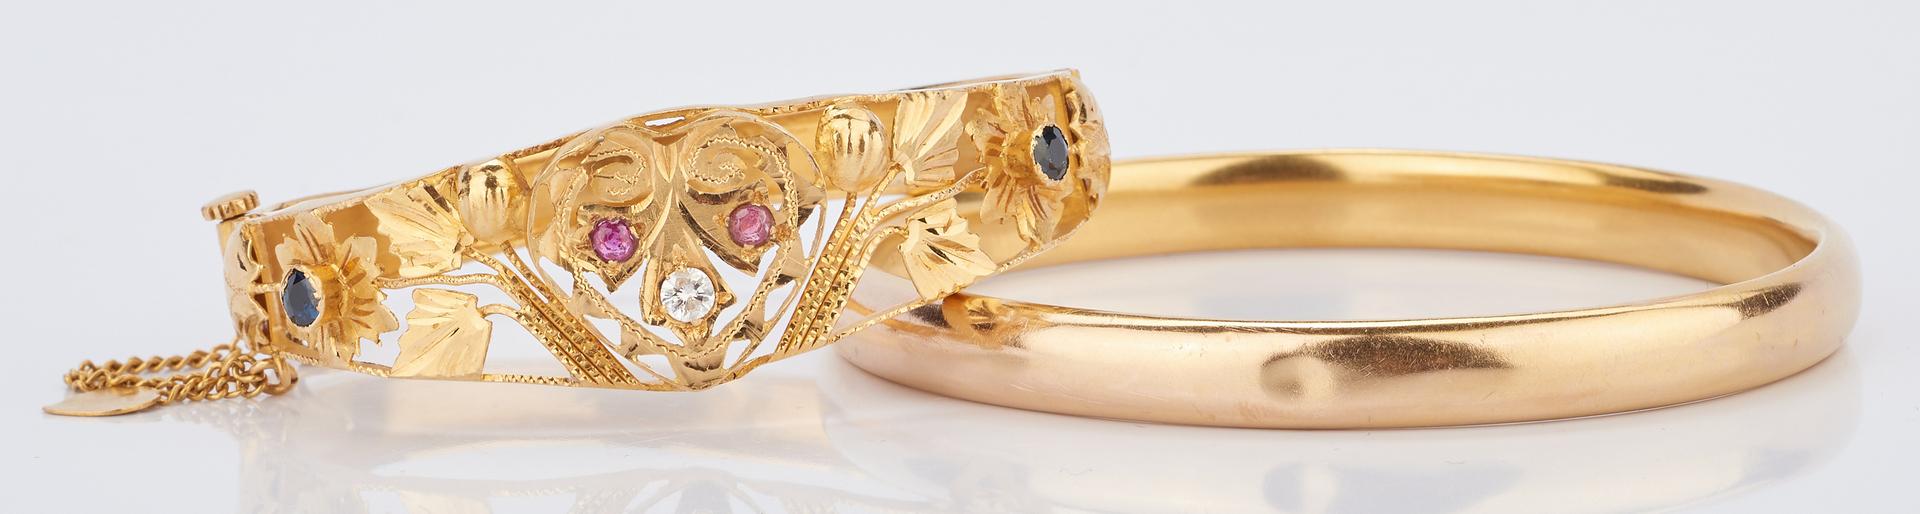 Lot 425: 2 Ladies Gold Bracelets, 1 w/ Gemstones